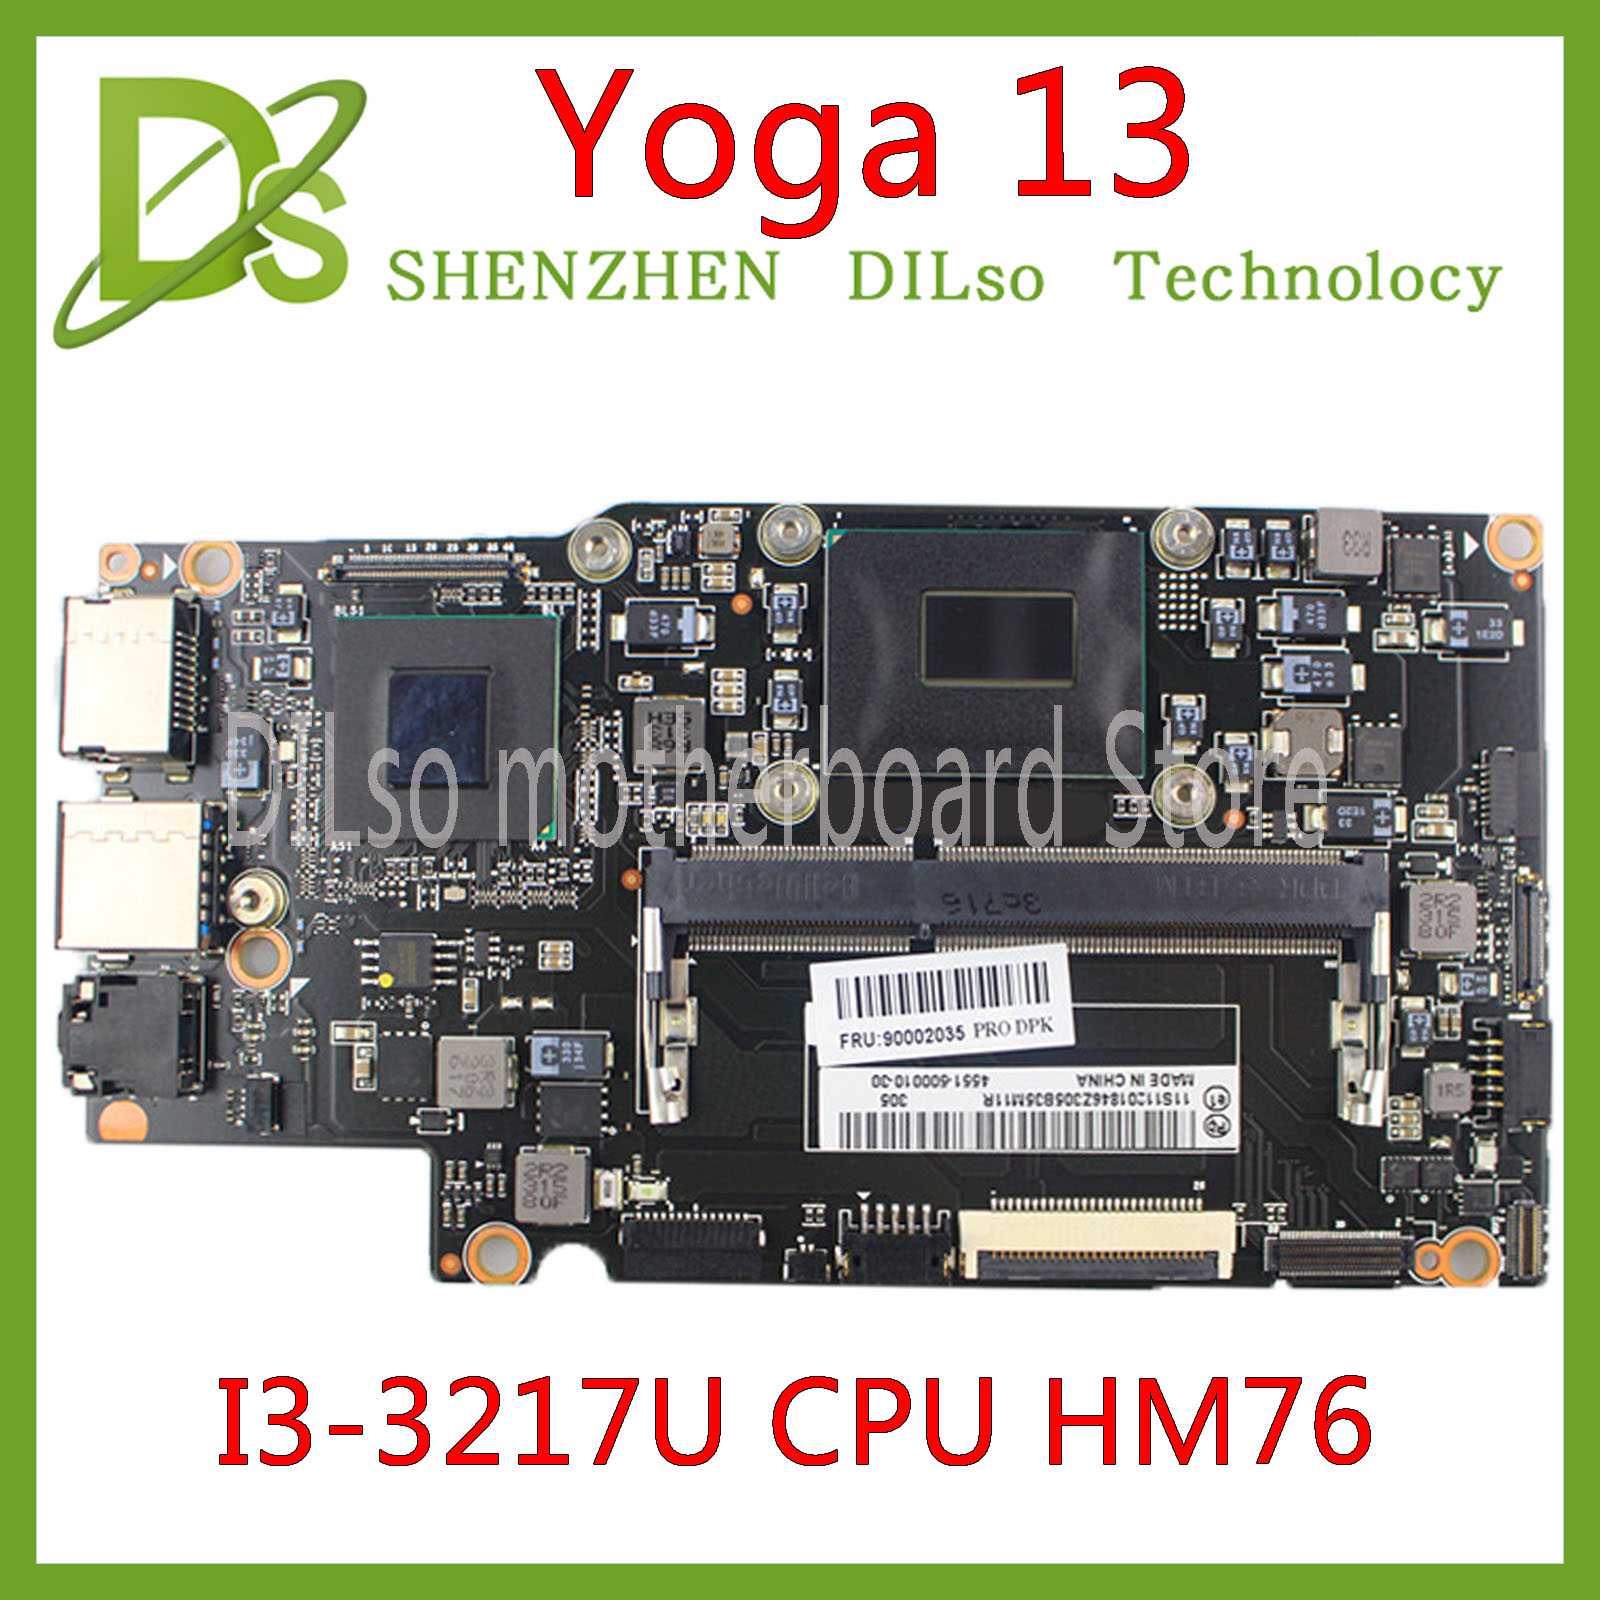 KEFU Yoga13 Mainboard For Lenovo Yoga 13 Yoga13 Laptop Motherboard FRU:90000652 With I3-3217U CPU HM76 Test 100% Original